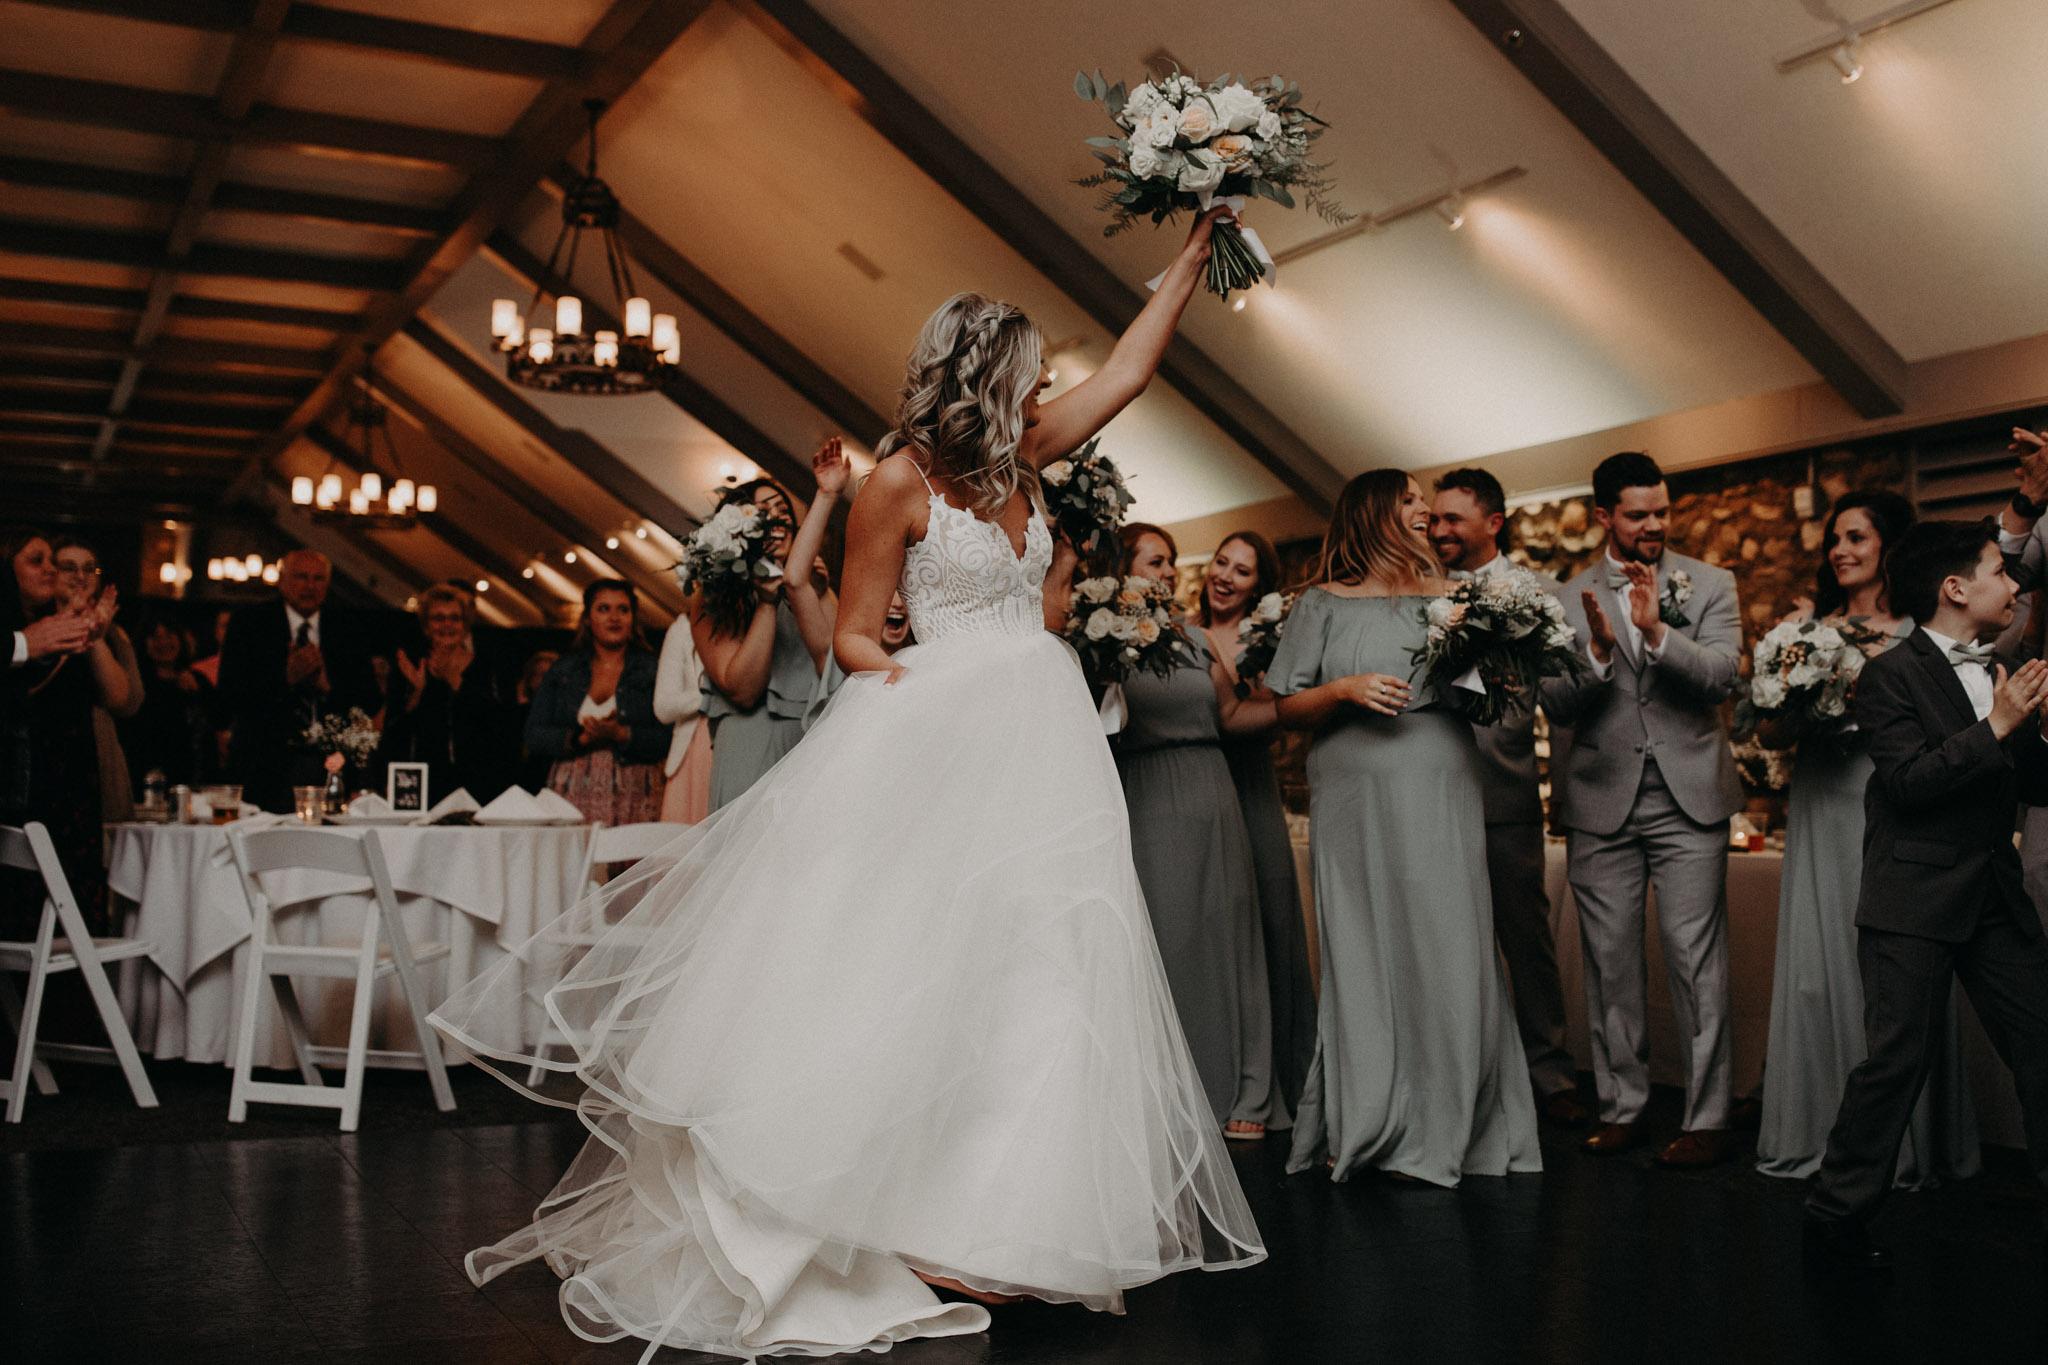 Castle-Farms-Lake-Charlevoix-Wedding-78.jpg